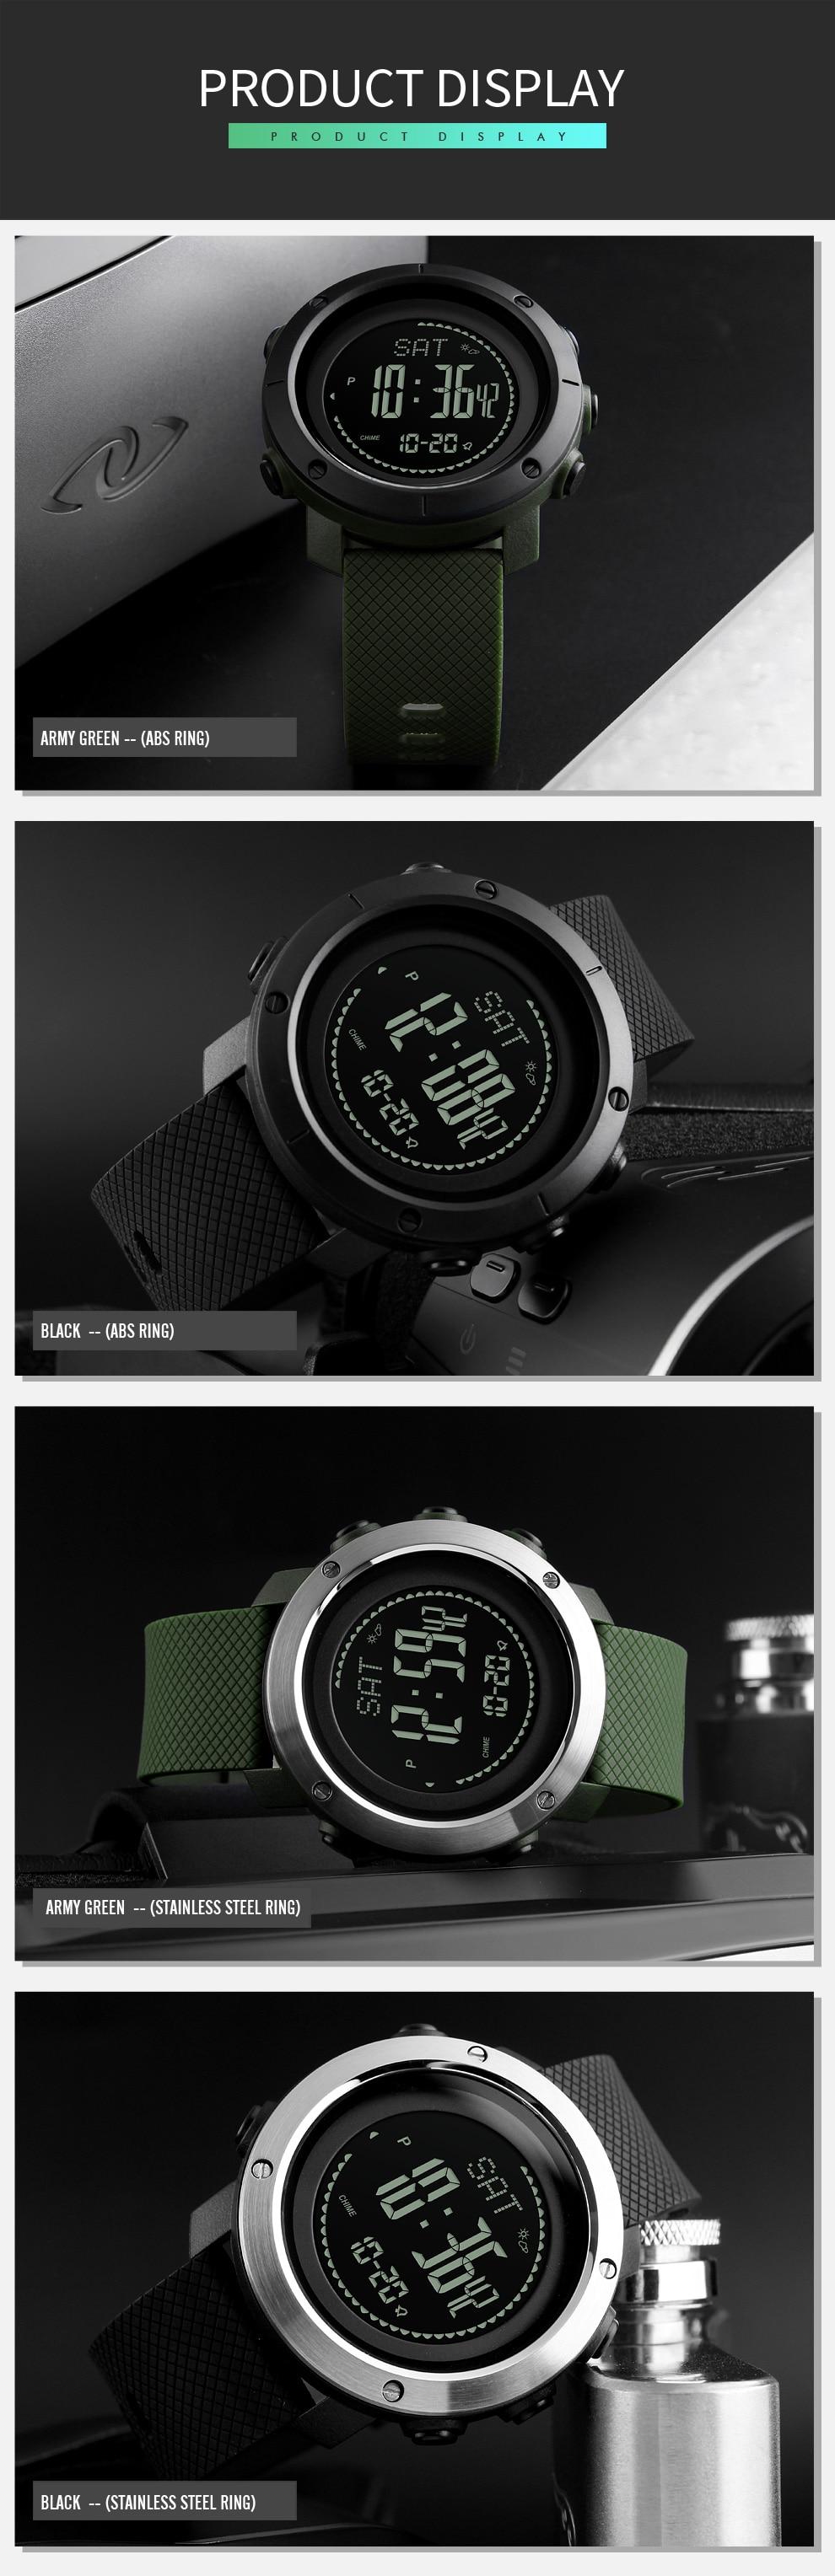 SKMEI Altimeter Barometer Thermometer Altitude Men Digital Watches Sports Clock Climbing Hiking Wristwatch Montre Homme 1418 11